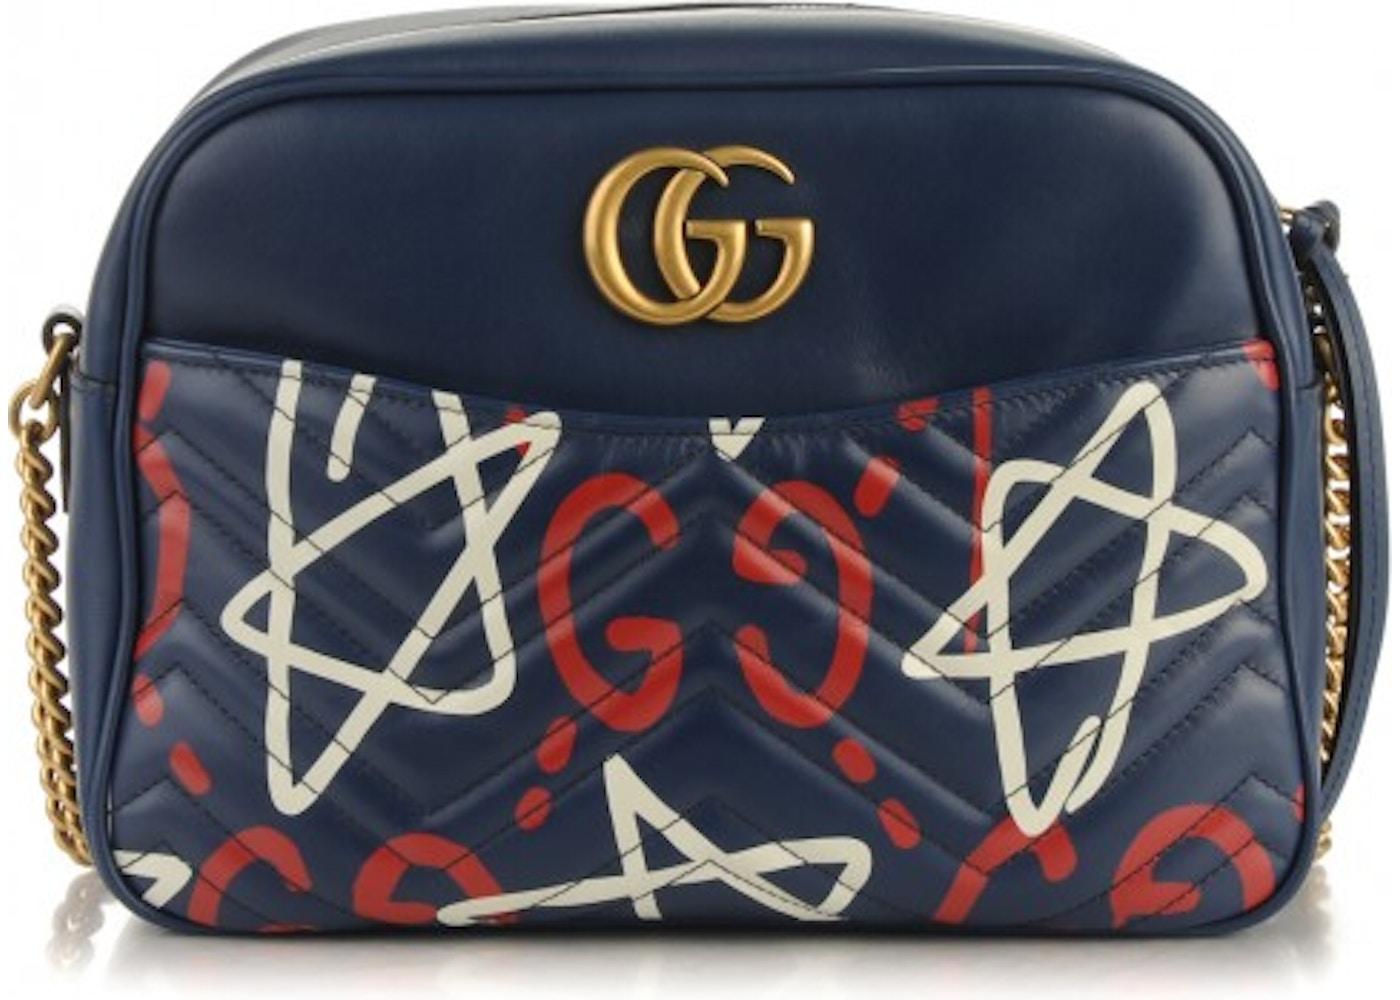 b2baa832d7dc Gucci Shoulder Bag Marmont Guccighost Medium Blue/Red/White